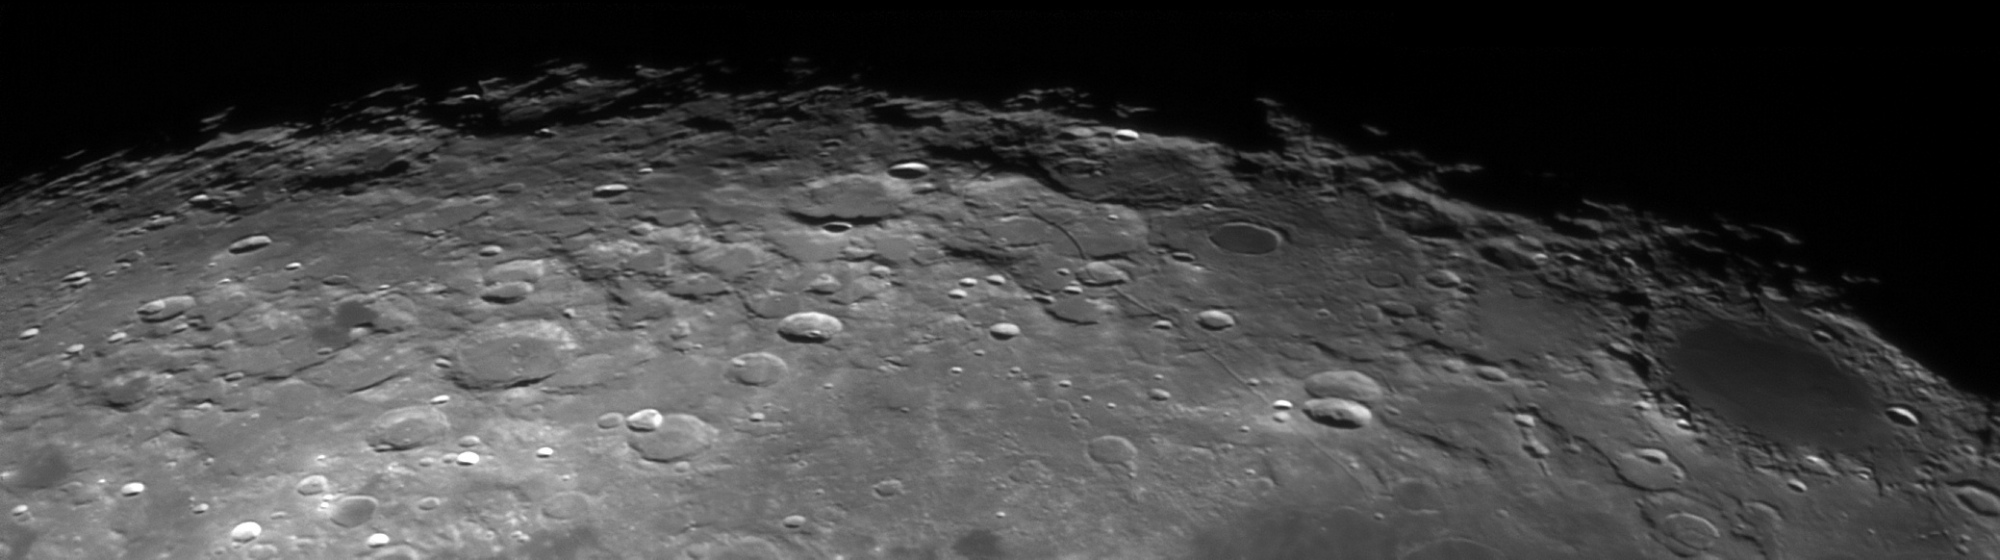 lune3.thumb.jpg.f8a5a0f640ce6b3d2a3766db8925d755.jpg